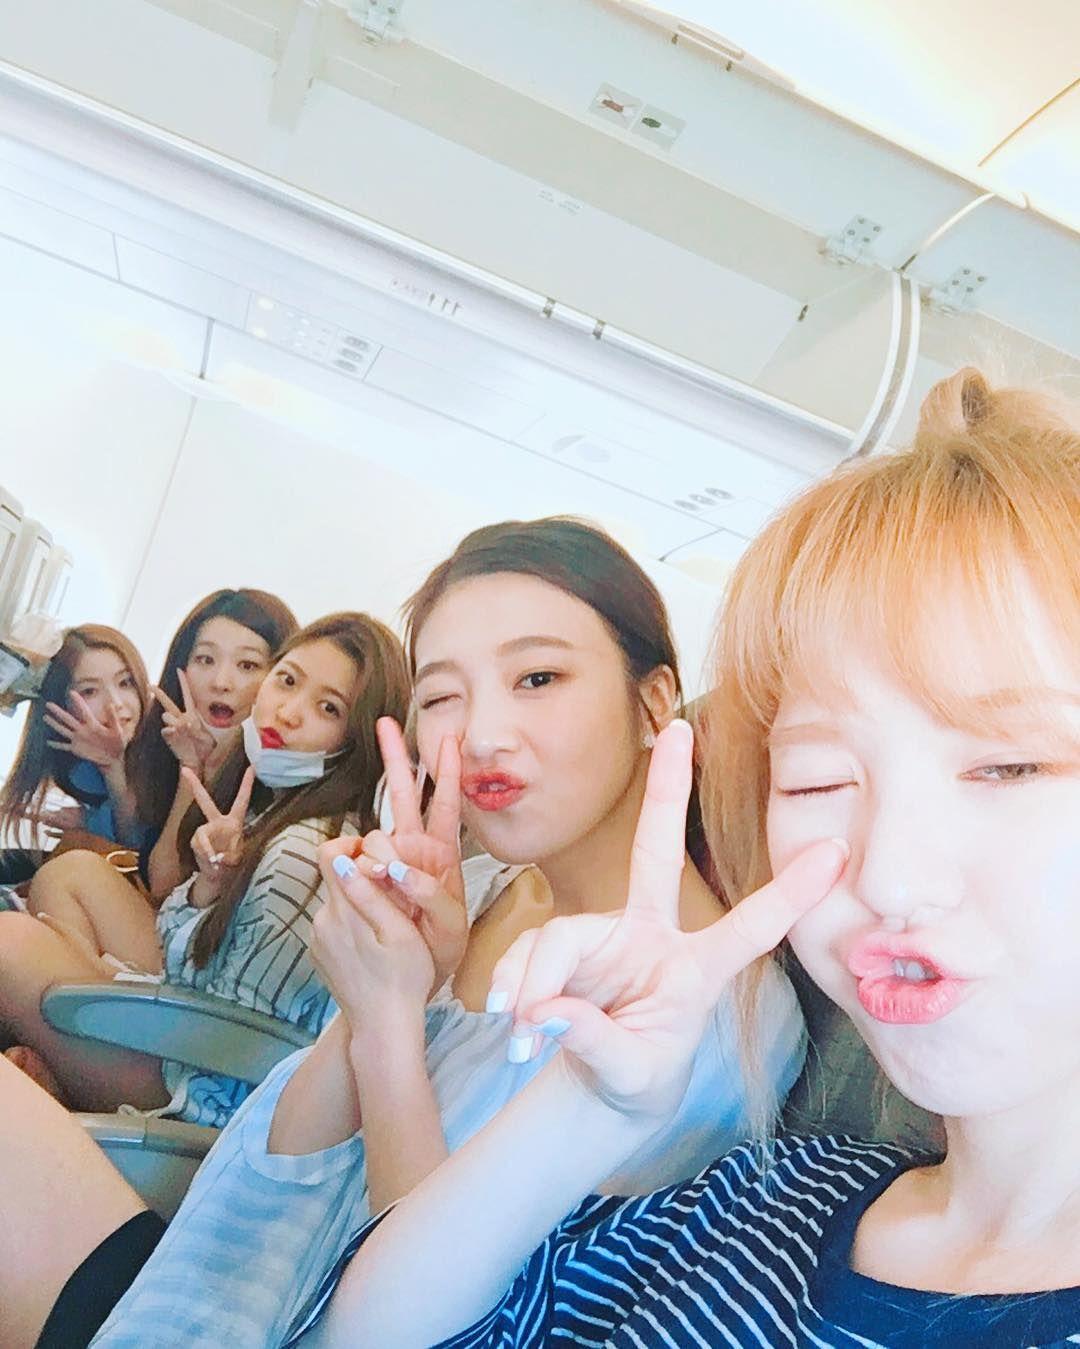 192.4 тыс. отметок «Нравится», 2,849 комментариев — Red Velvet Official Instagram (@redvelvet.smtown) в Instagram: «이제 한국가용~ 맨 앞에 있는 우리 머리 안커요ㅎㅎ💙💚 앞에 있어서그래요ㅎㅎ #레드벨벳 #조이»